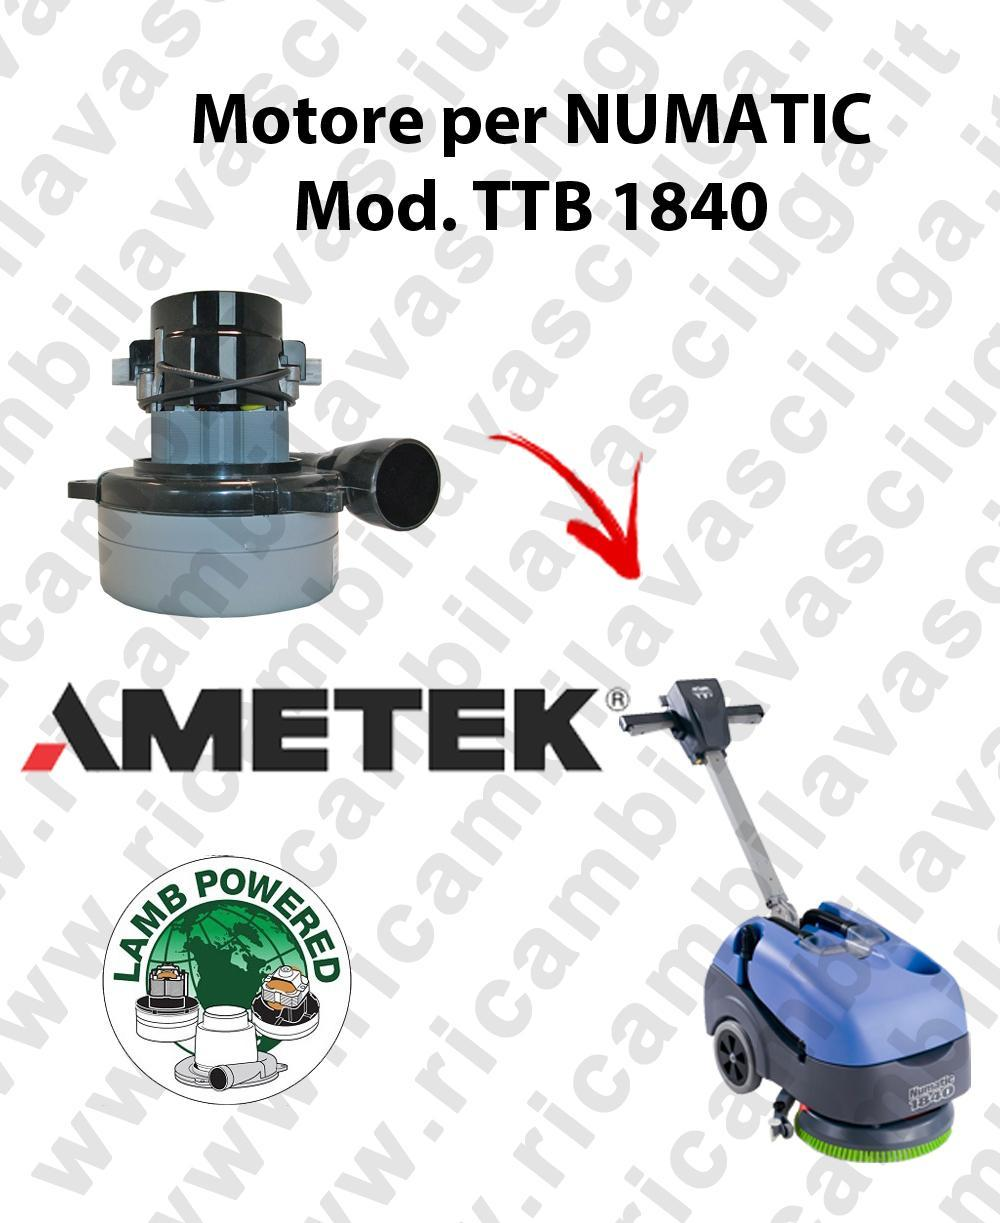 TTB 1840 Ametek Vacuum Motor scrubber dryer NUMATIC